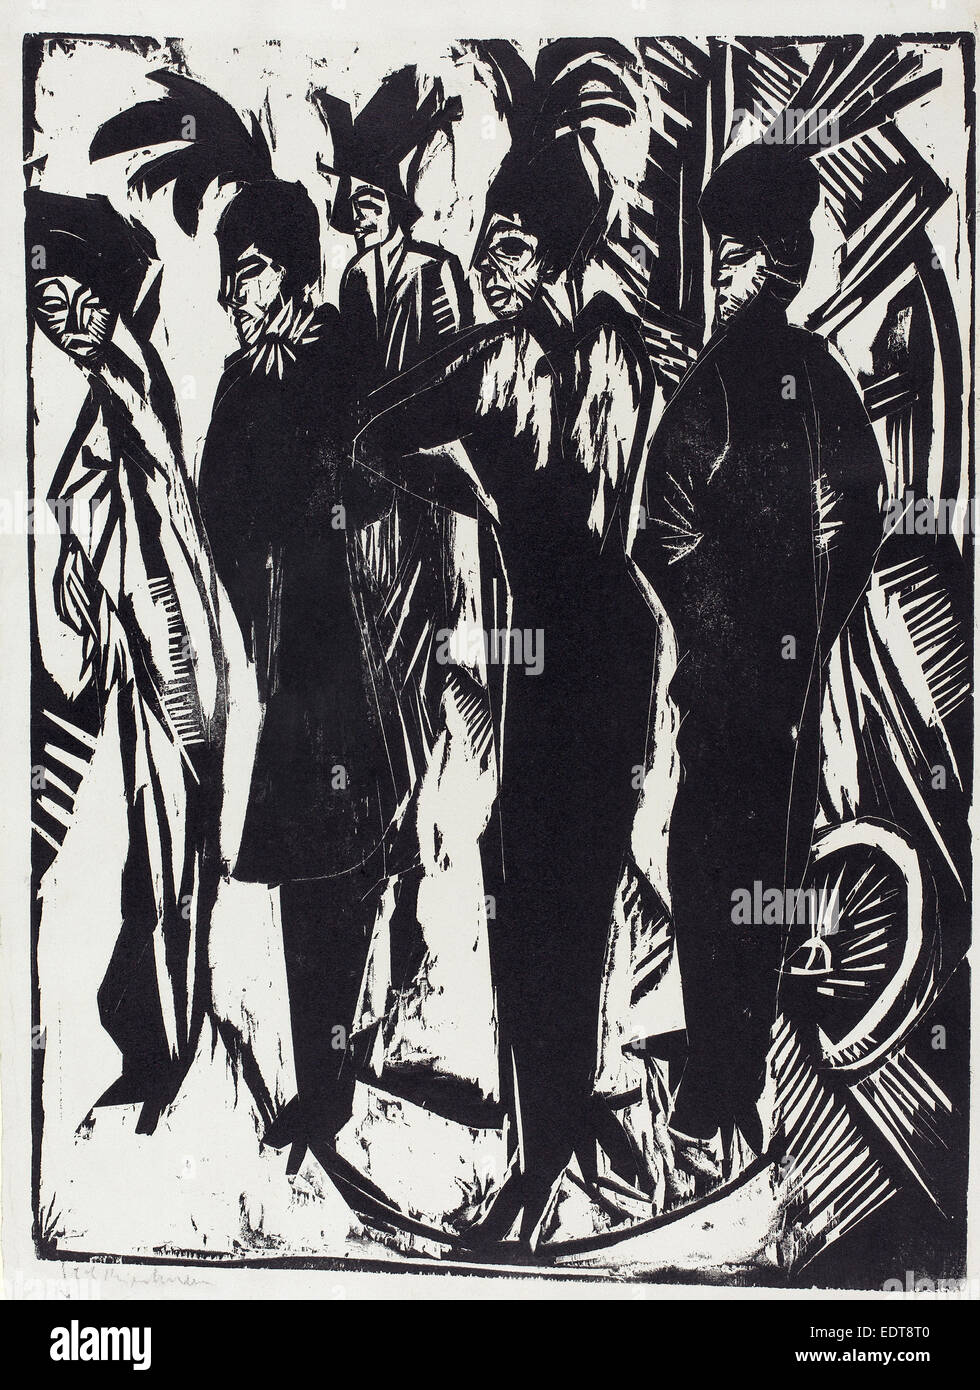 Ernst Ludwig Kirchner, Five Tarts (Fünf Kokotten), German, 1880 - 1938, 1914, woodcut on blotting paper - Stock Image